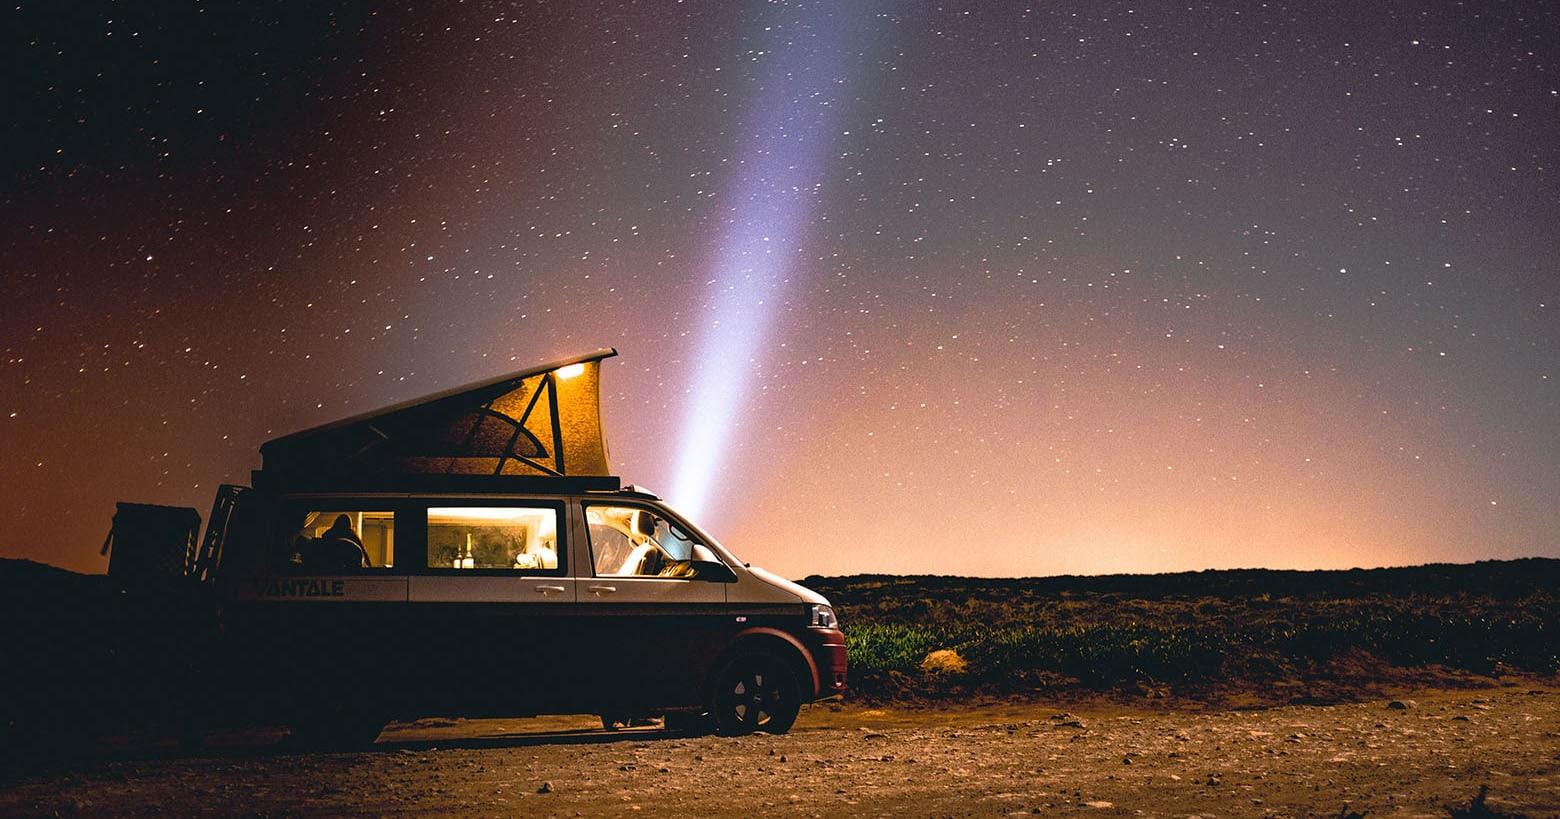 Tasmania Campervan Hire Comparison | Rent the best!